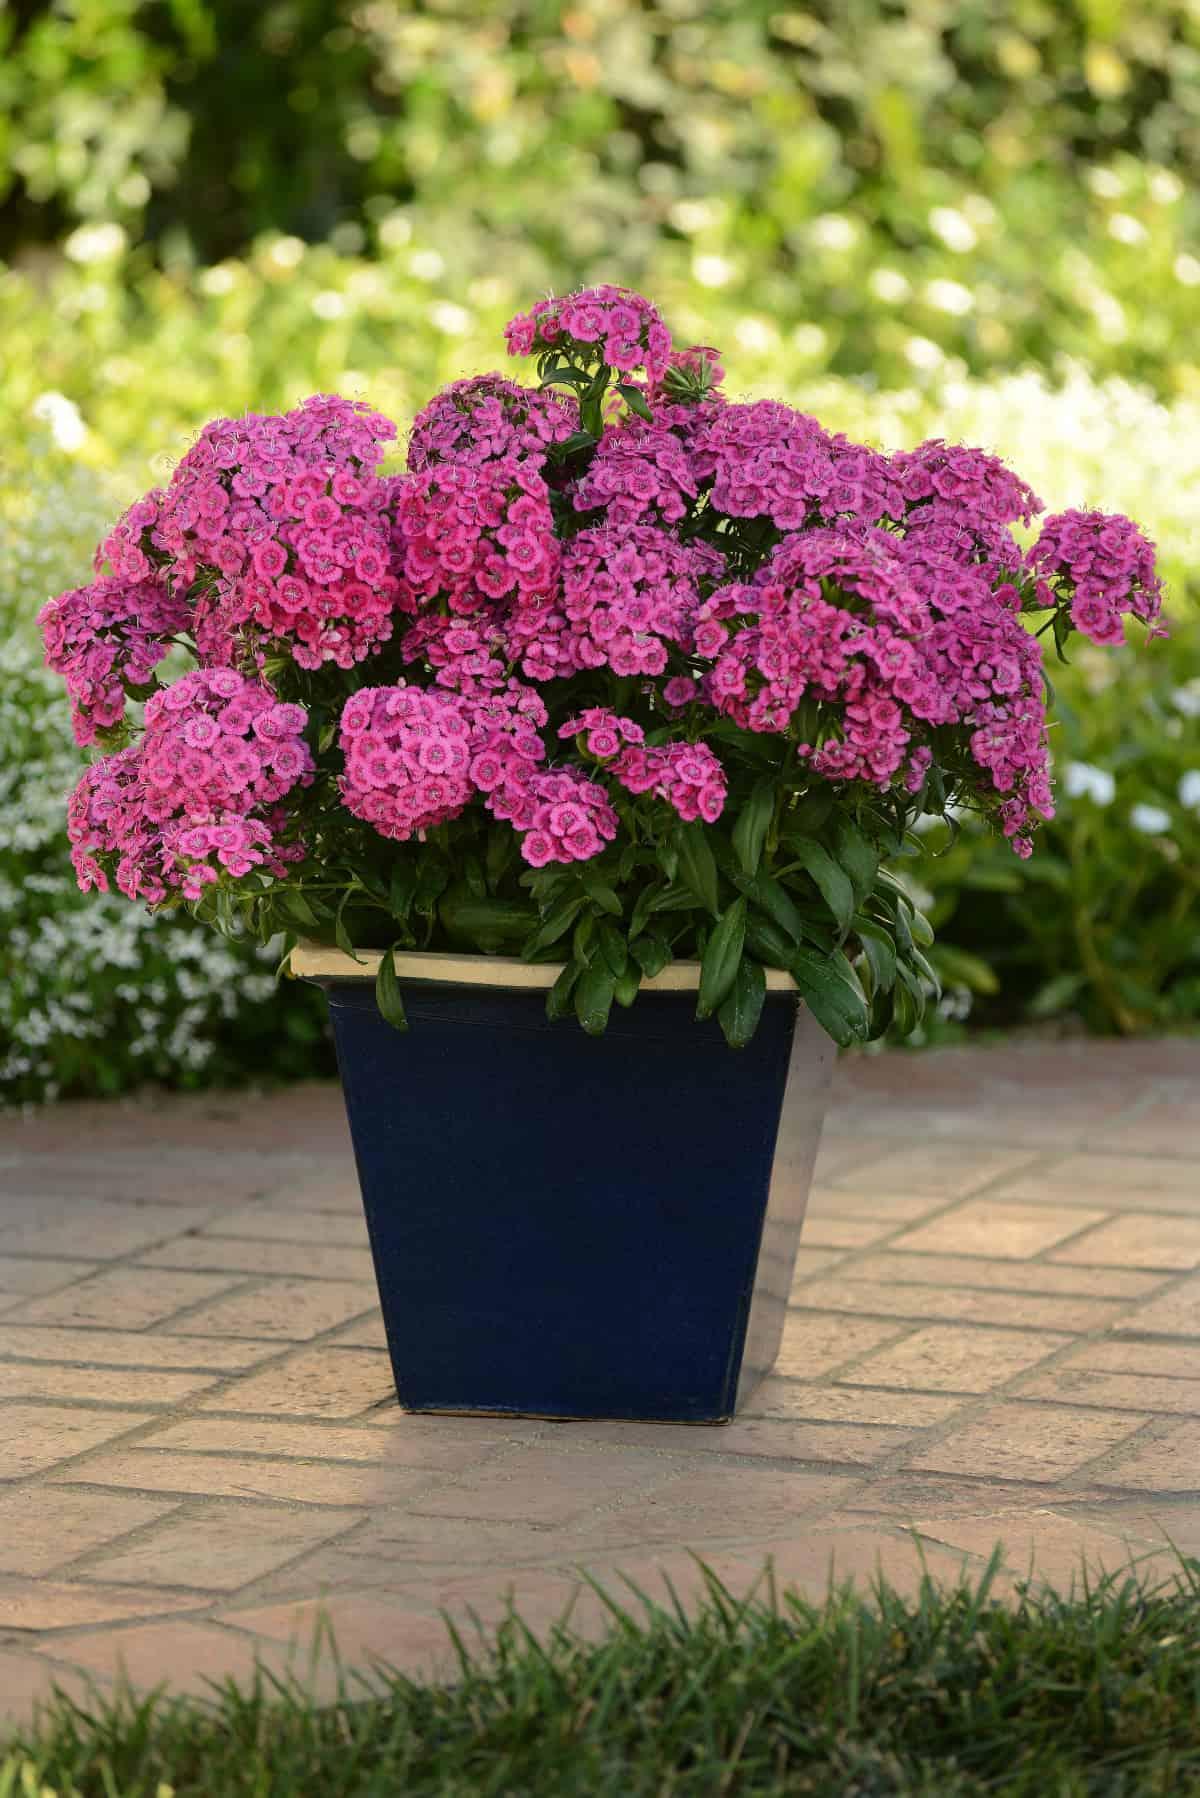 Dianthus interspecific jolt pink f1 all america selections dianthus jolt pink f1 jolt is the most heat tolerant dianthus on the market izmirmasajfo